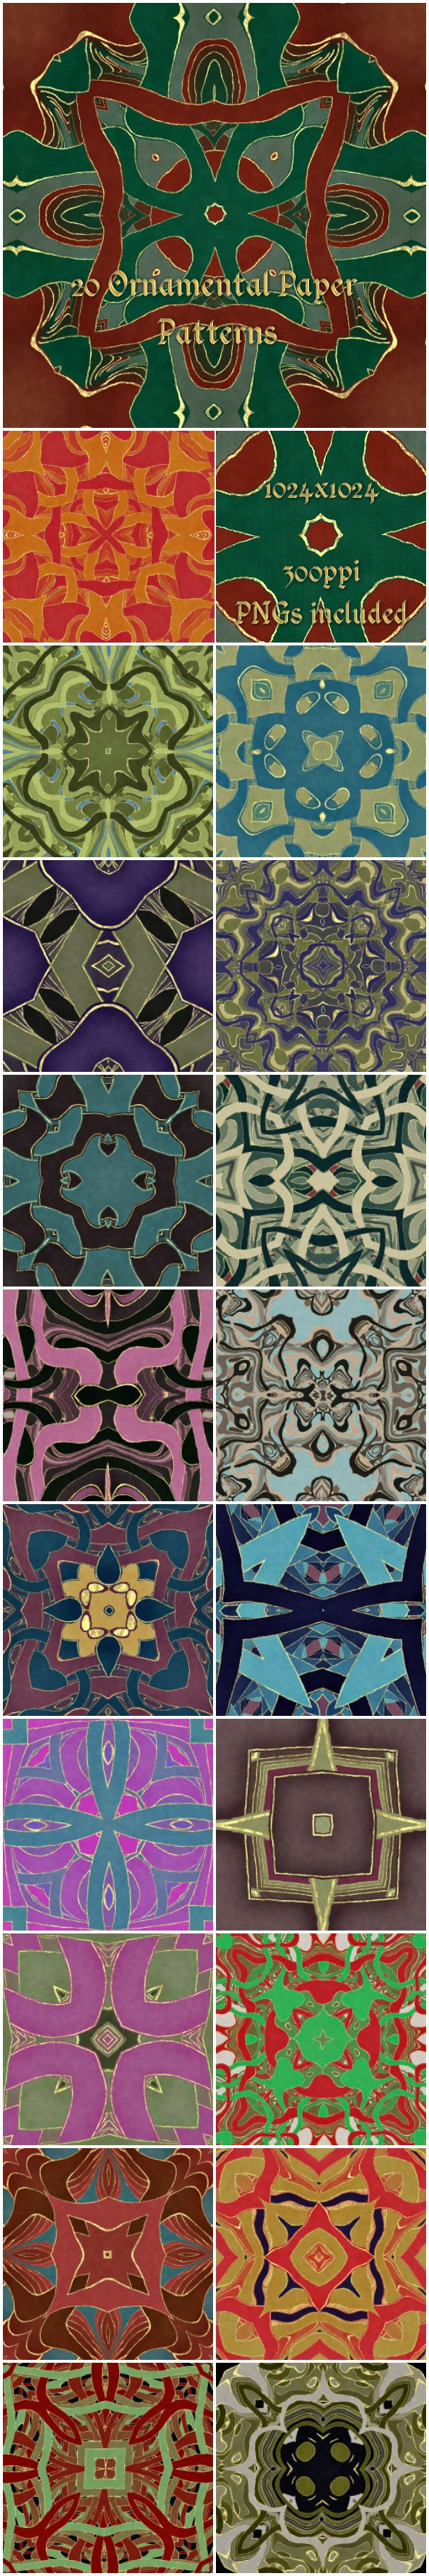 20 Ornamental Paper Patterns - Artistic Textures / Fills / Patterns